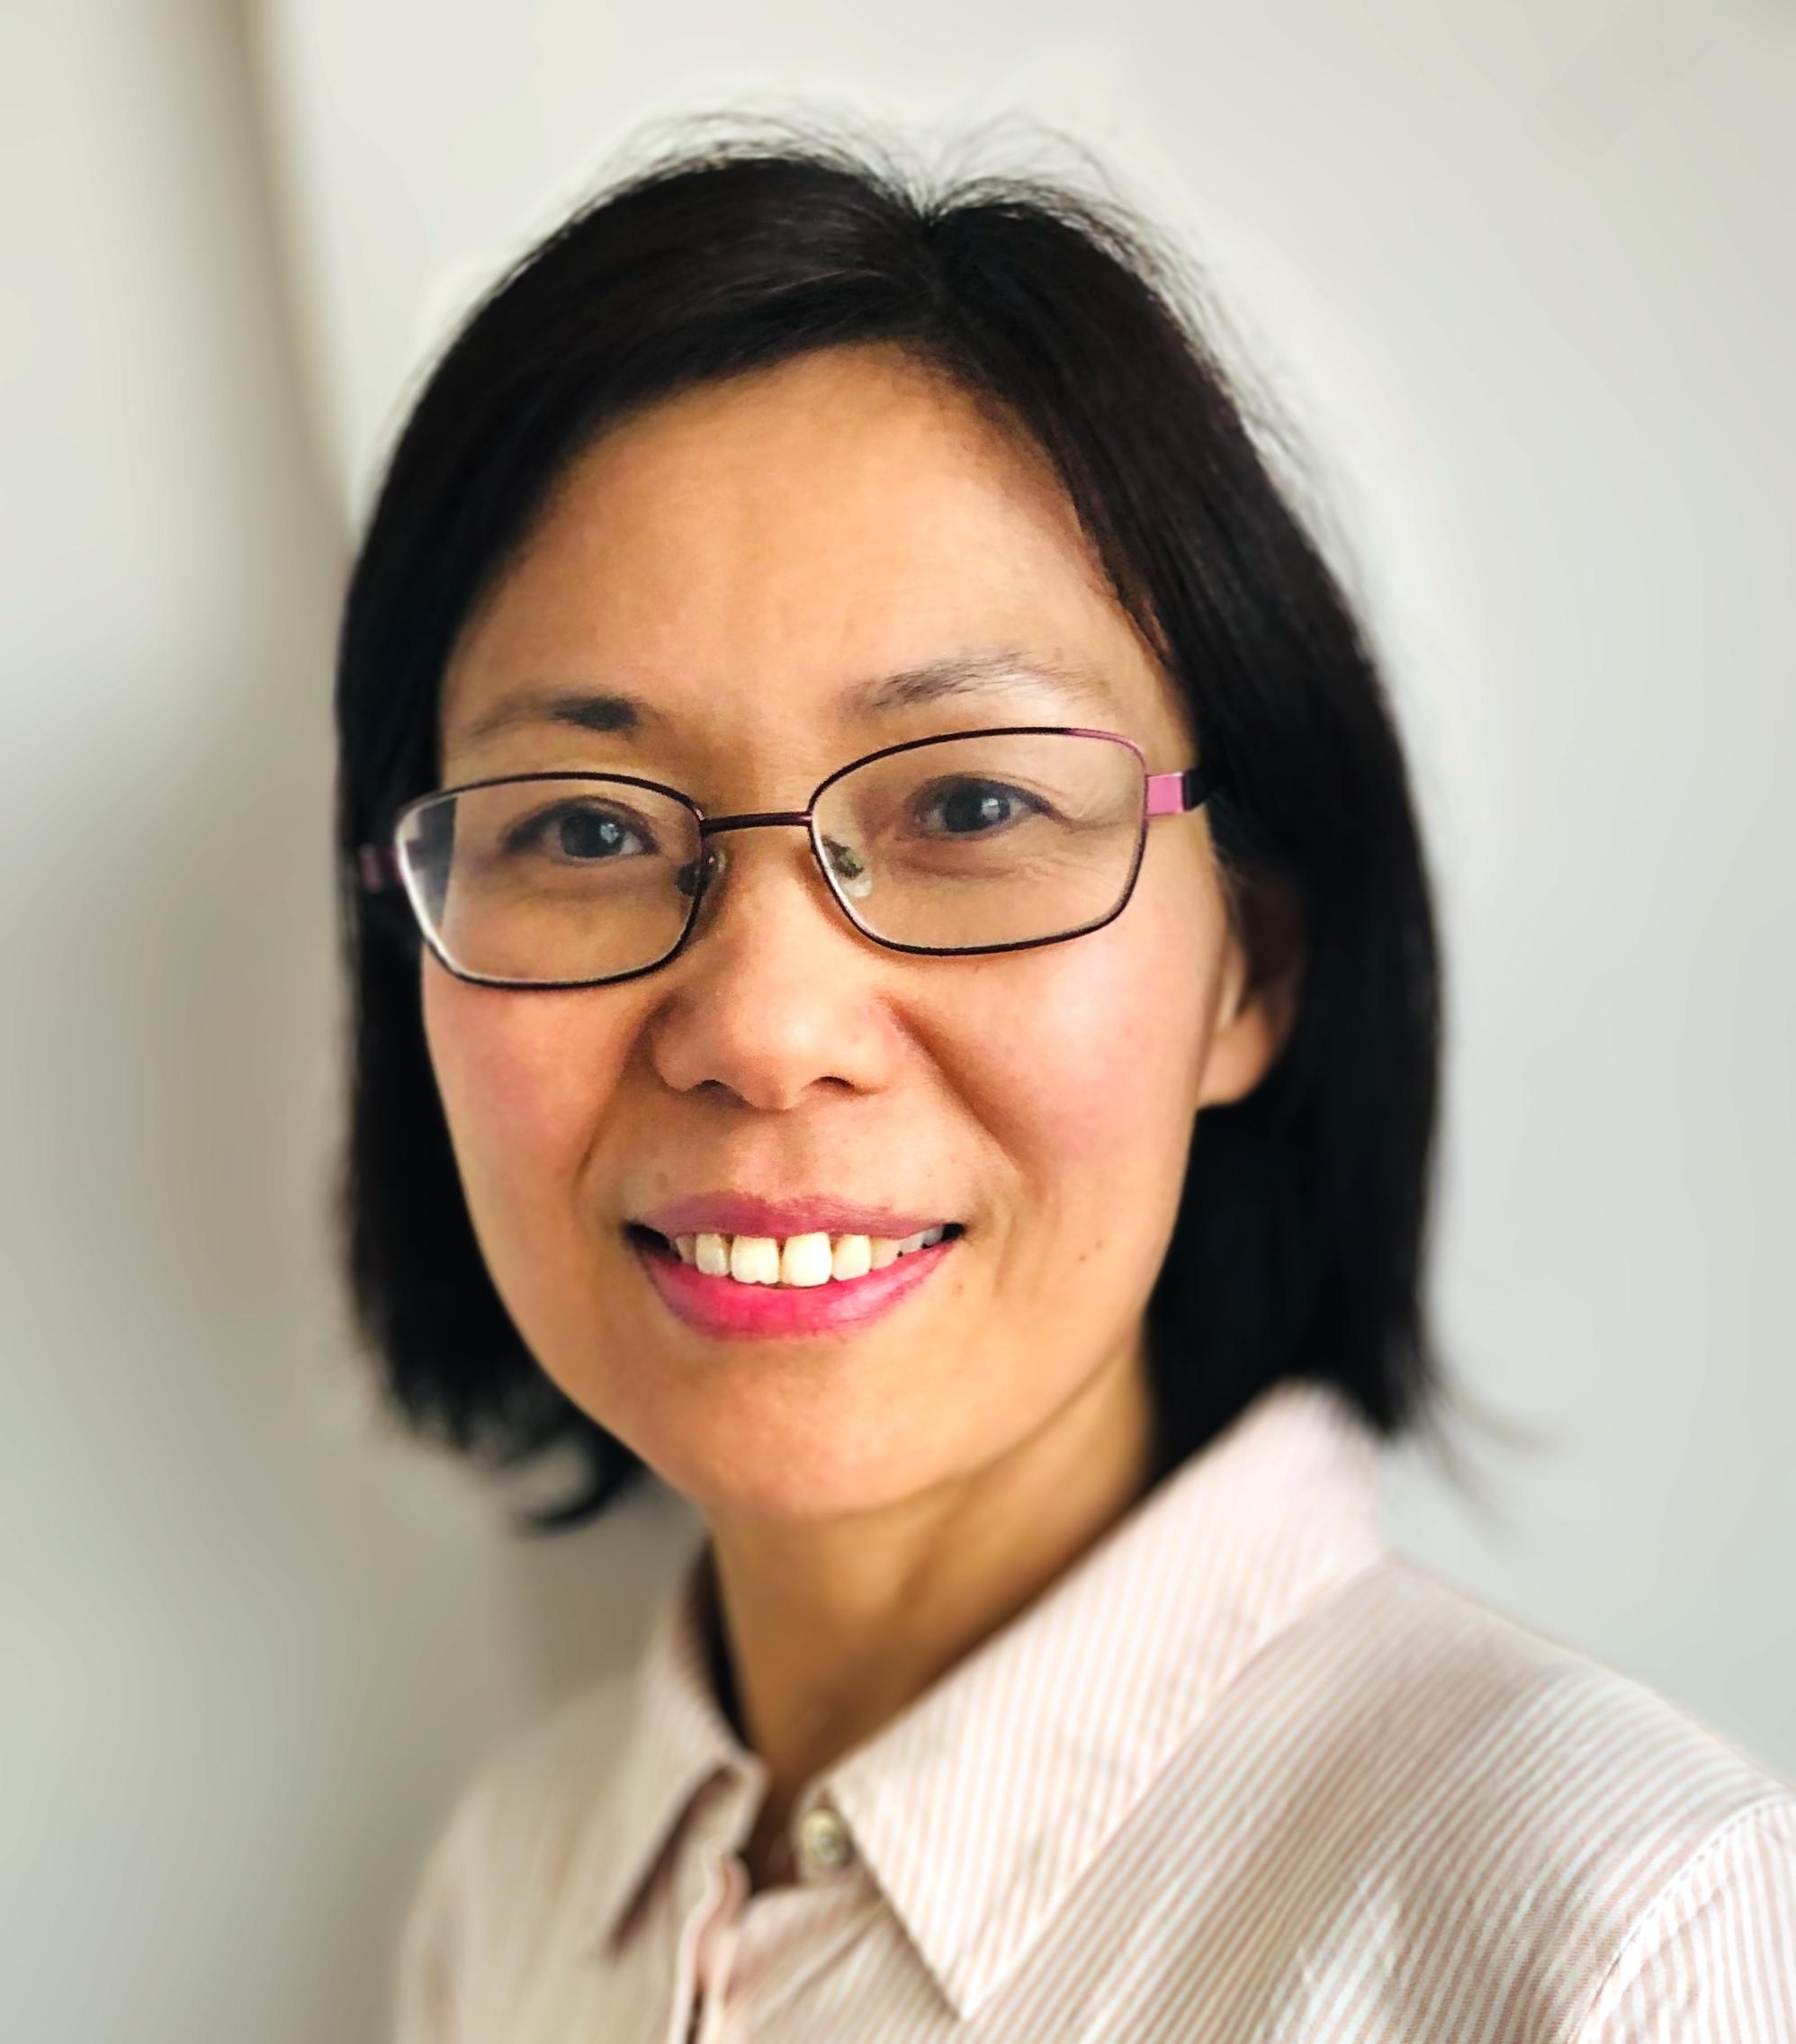 Irene-Managing Director